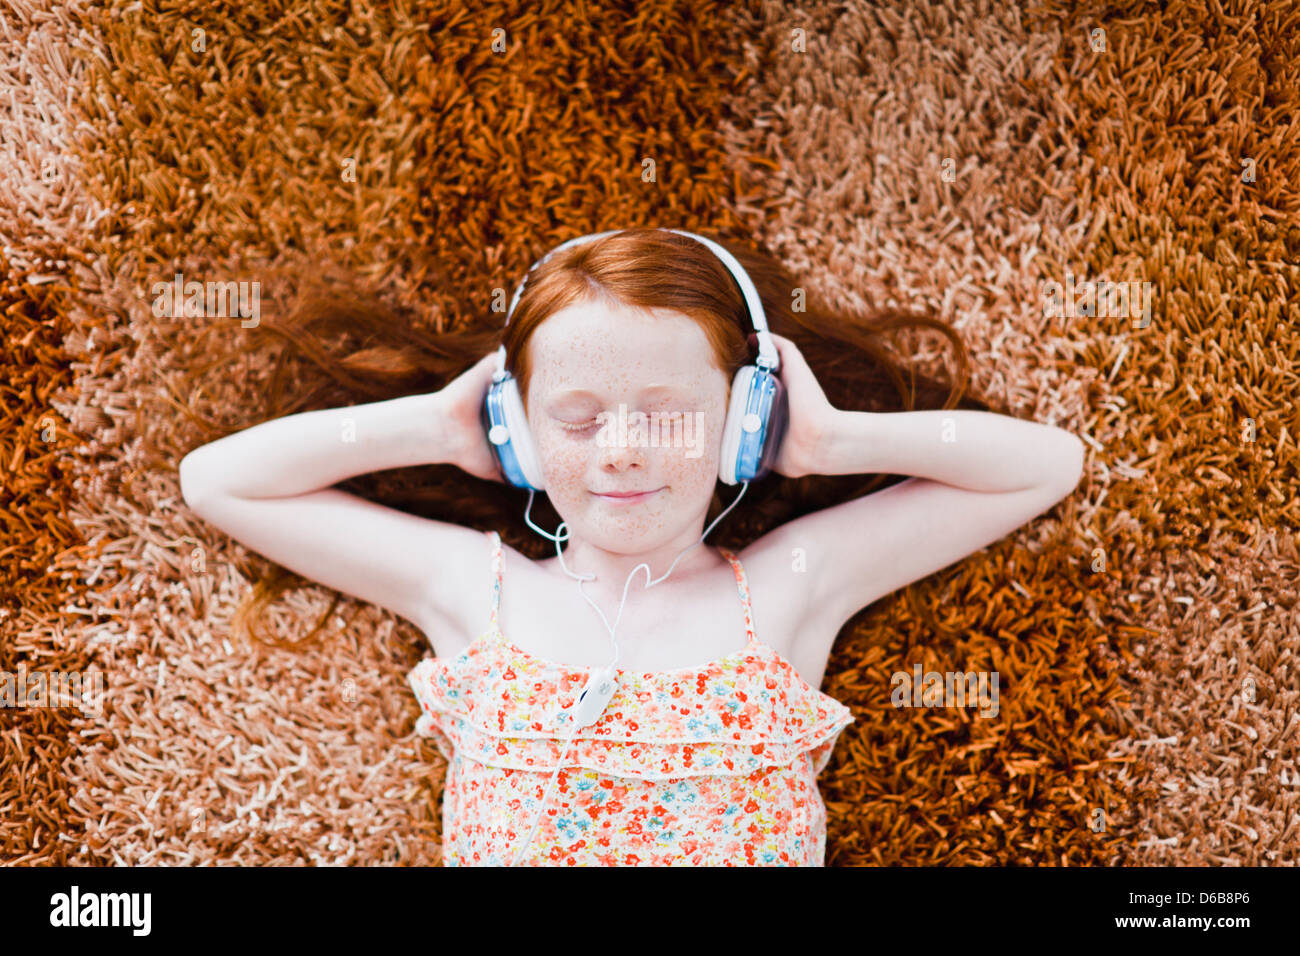 Girl listening to headphones on carpet - Stock Image